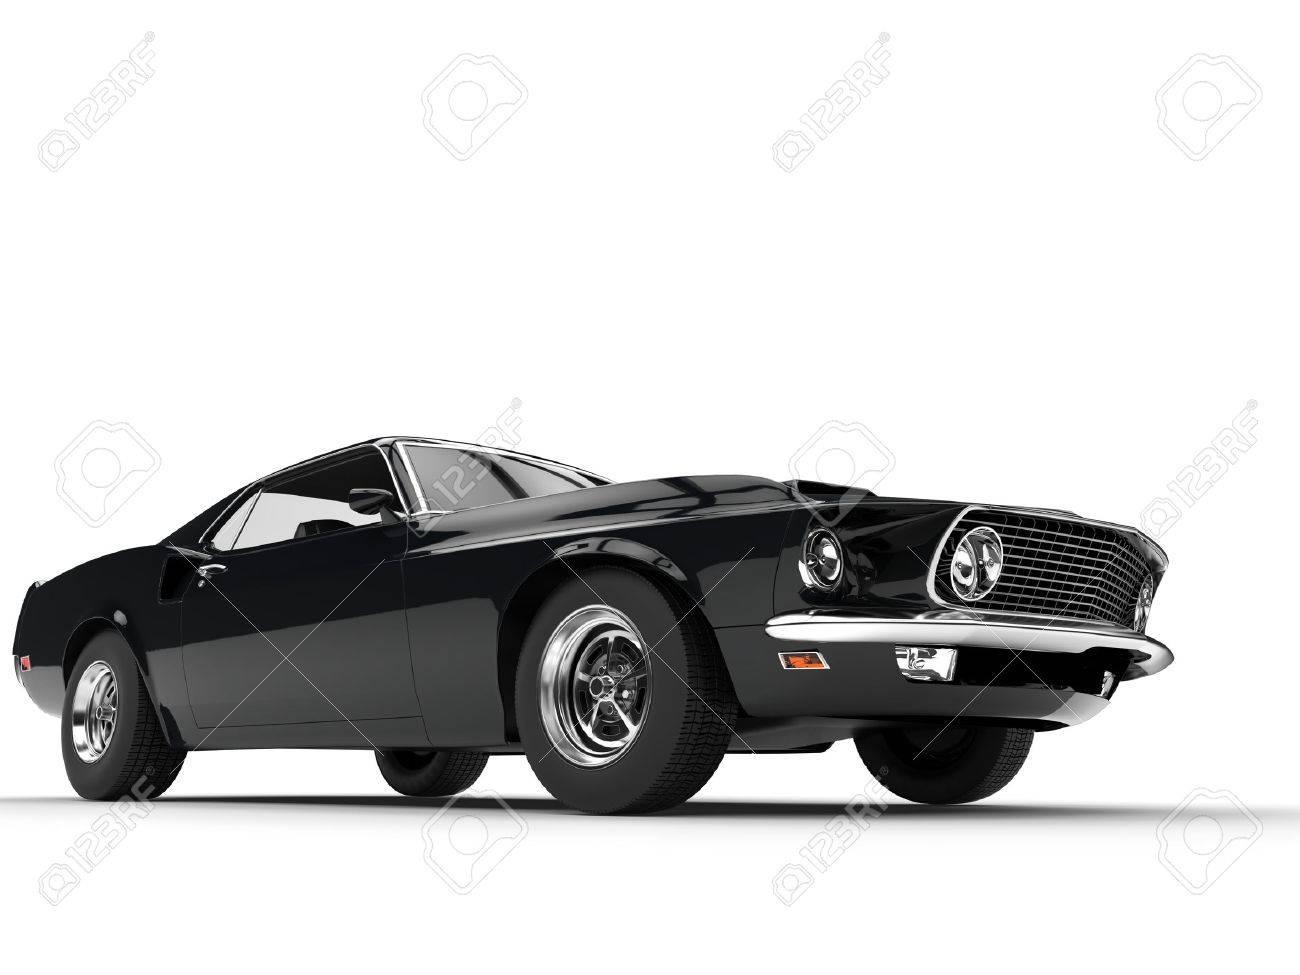 große muscle car - low angle power shot lizenzfreie fotos, bilder